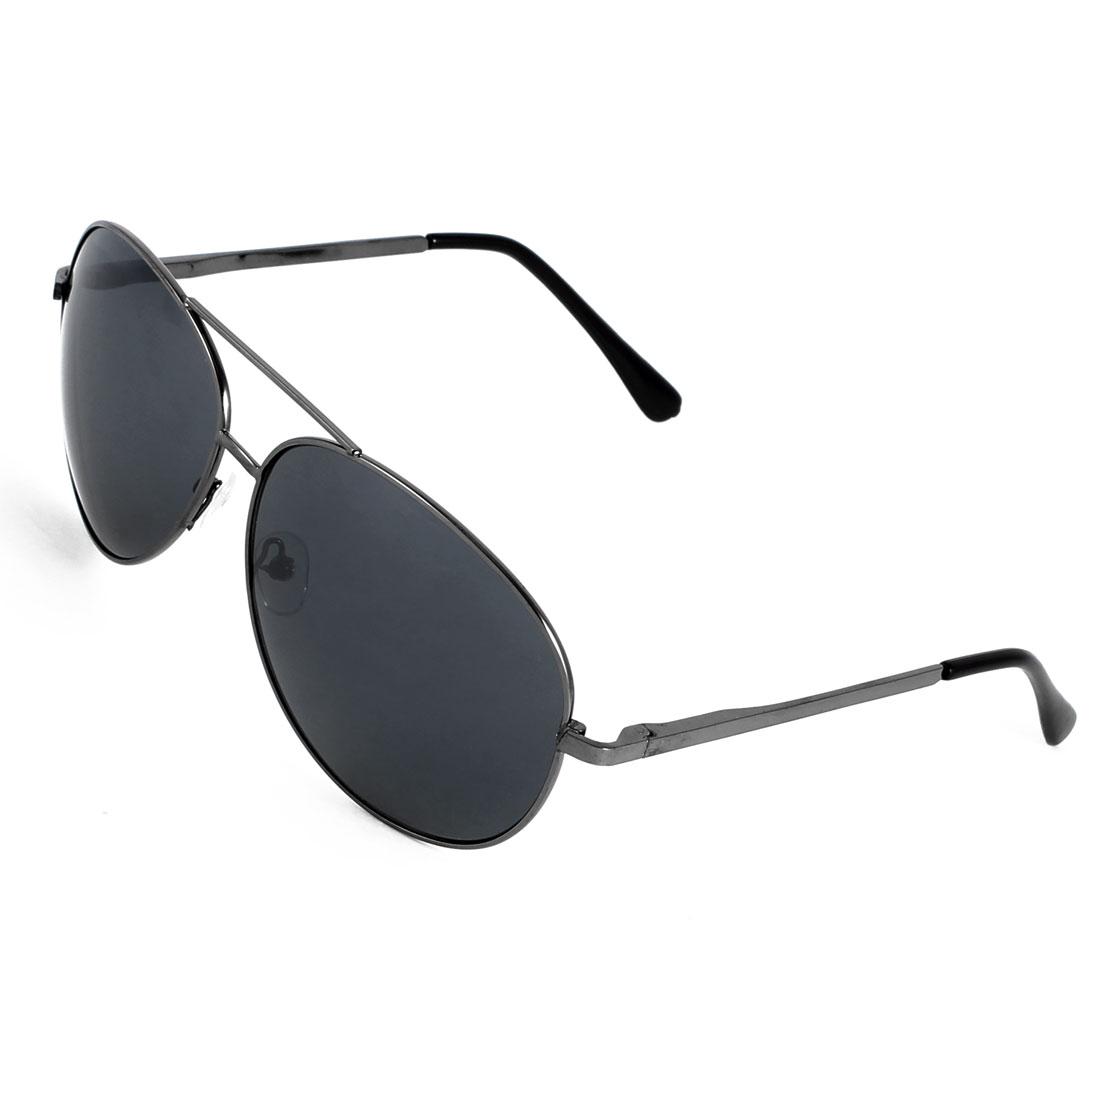 Men Gray Teardrop Len Dual Bridge Half Plastic Coated Metal Arm Sunglasses